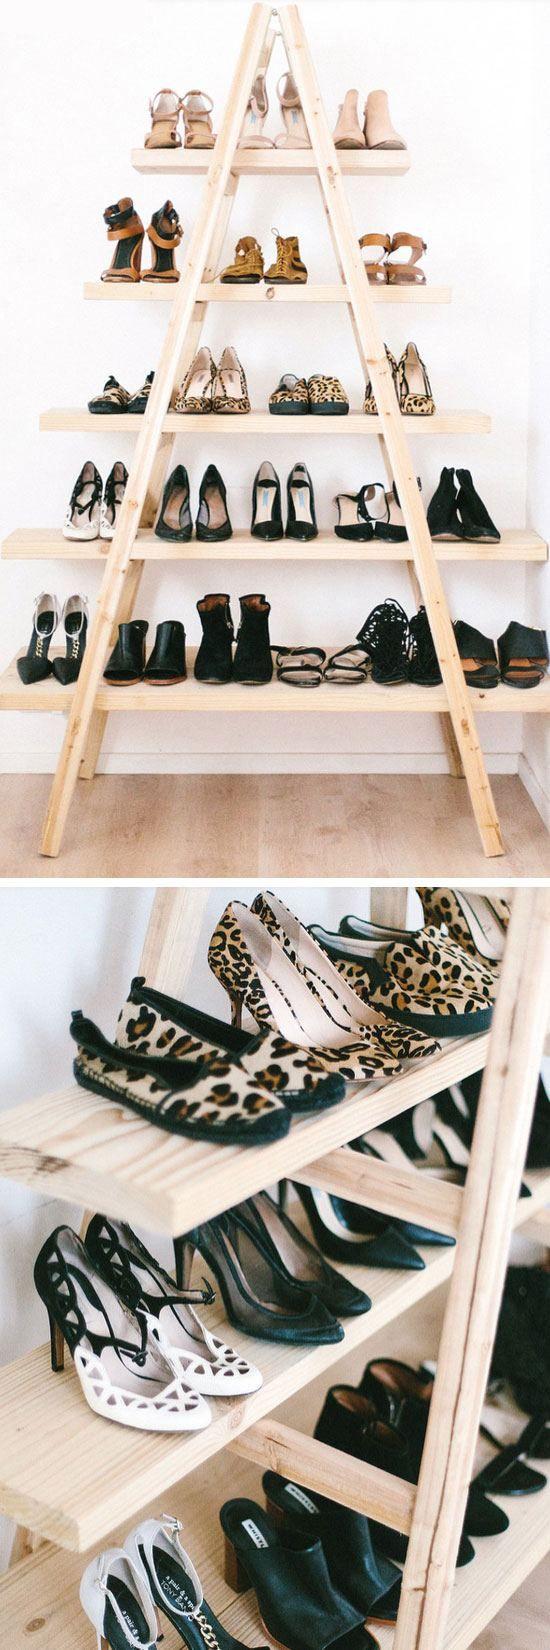 DIY Ladder Shoe Shelf | 22 DIY Shoe Storage Ideas Dollar Stores